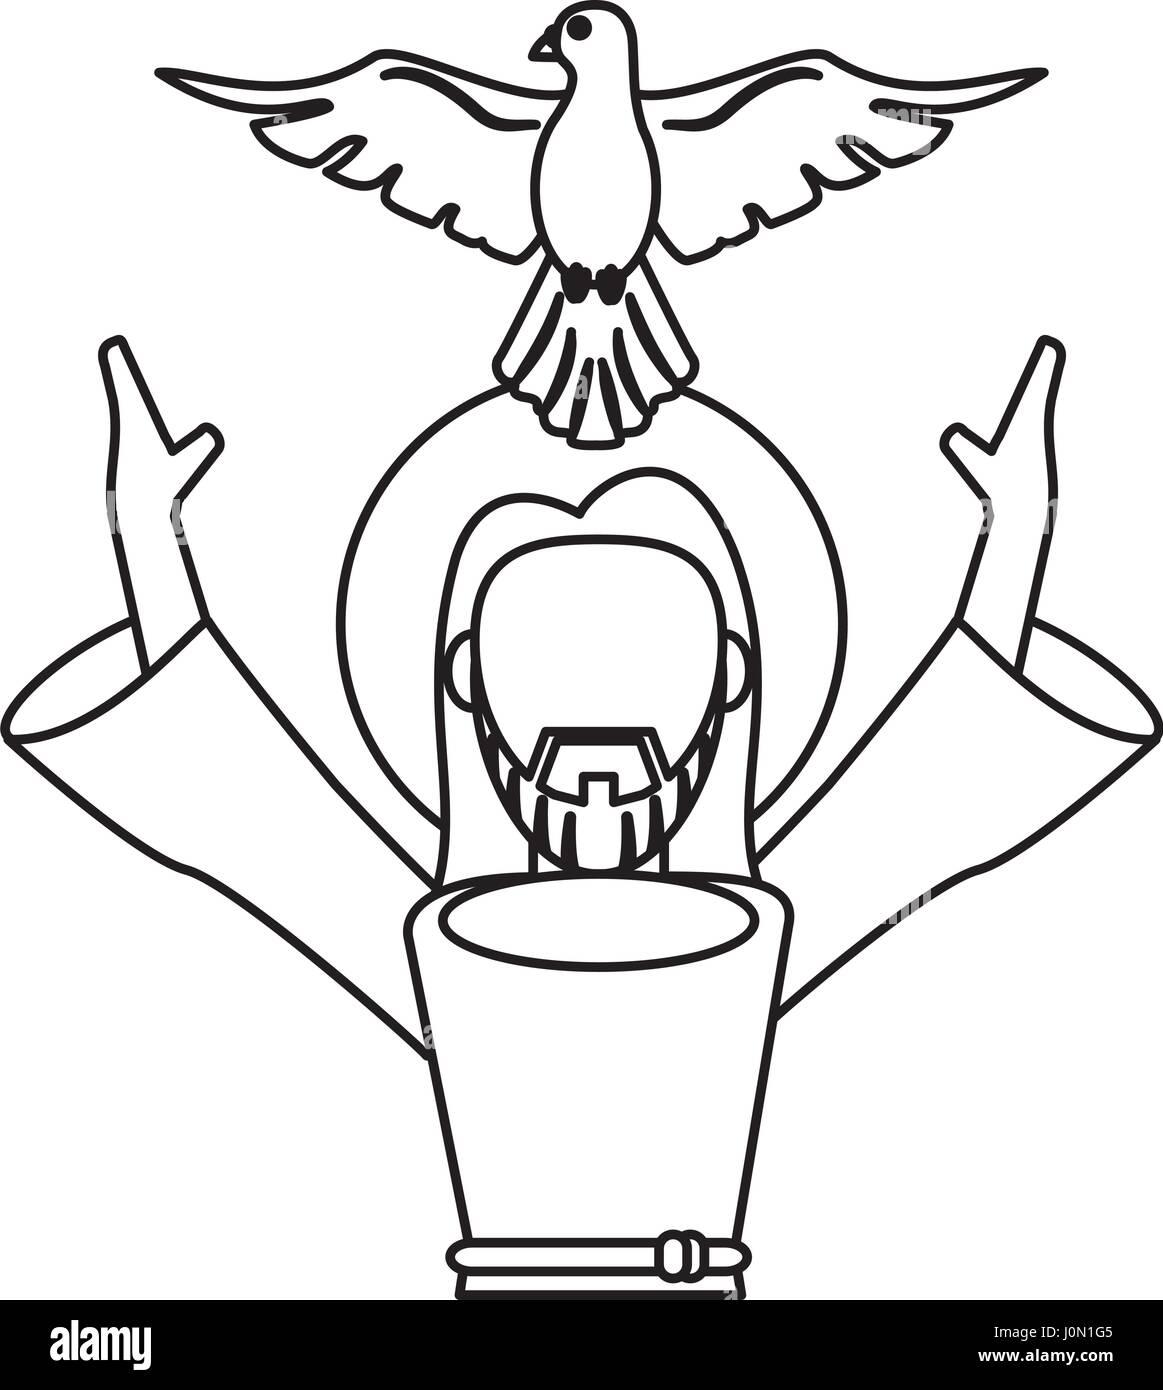 Jesus christ holy spirit catholic symbol outline stock vector art jesus christ holy spirit catholic symbol outline buycottarizona Image collections